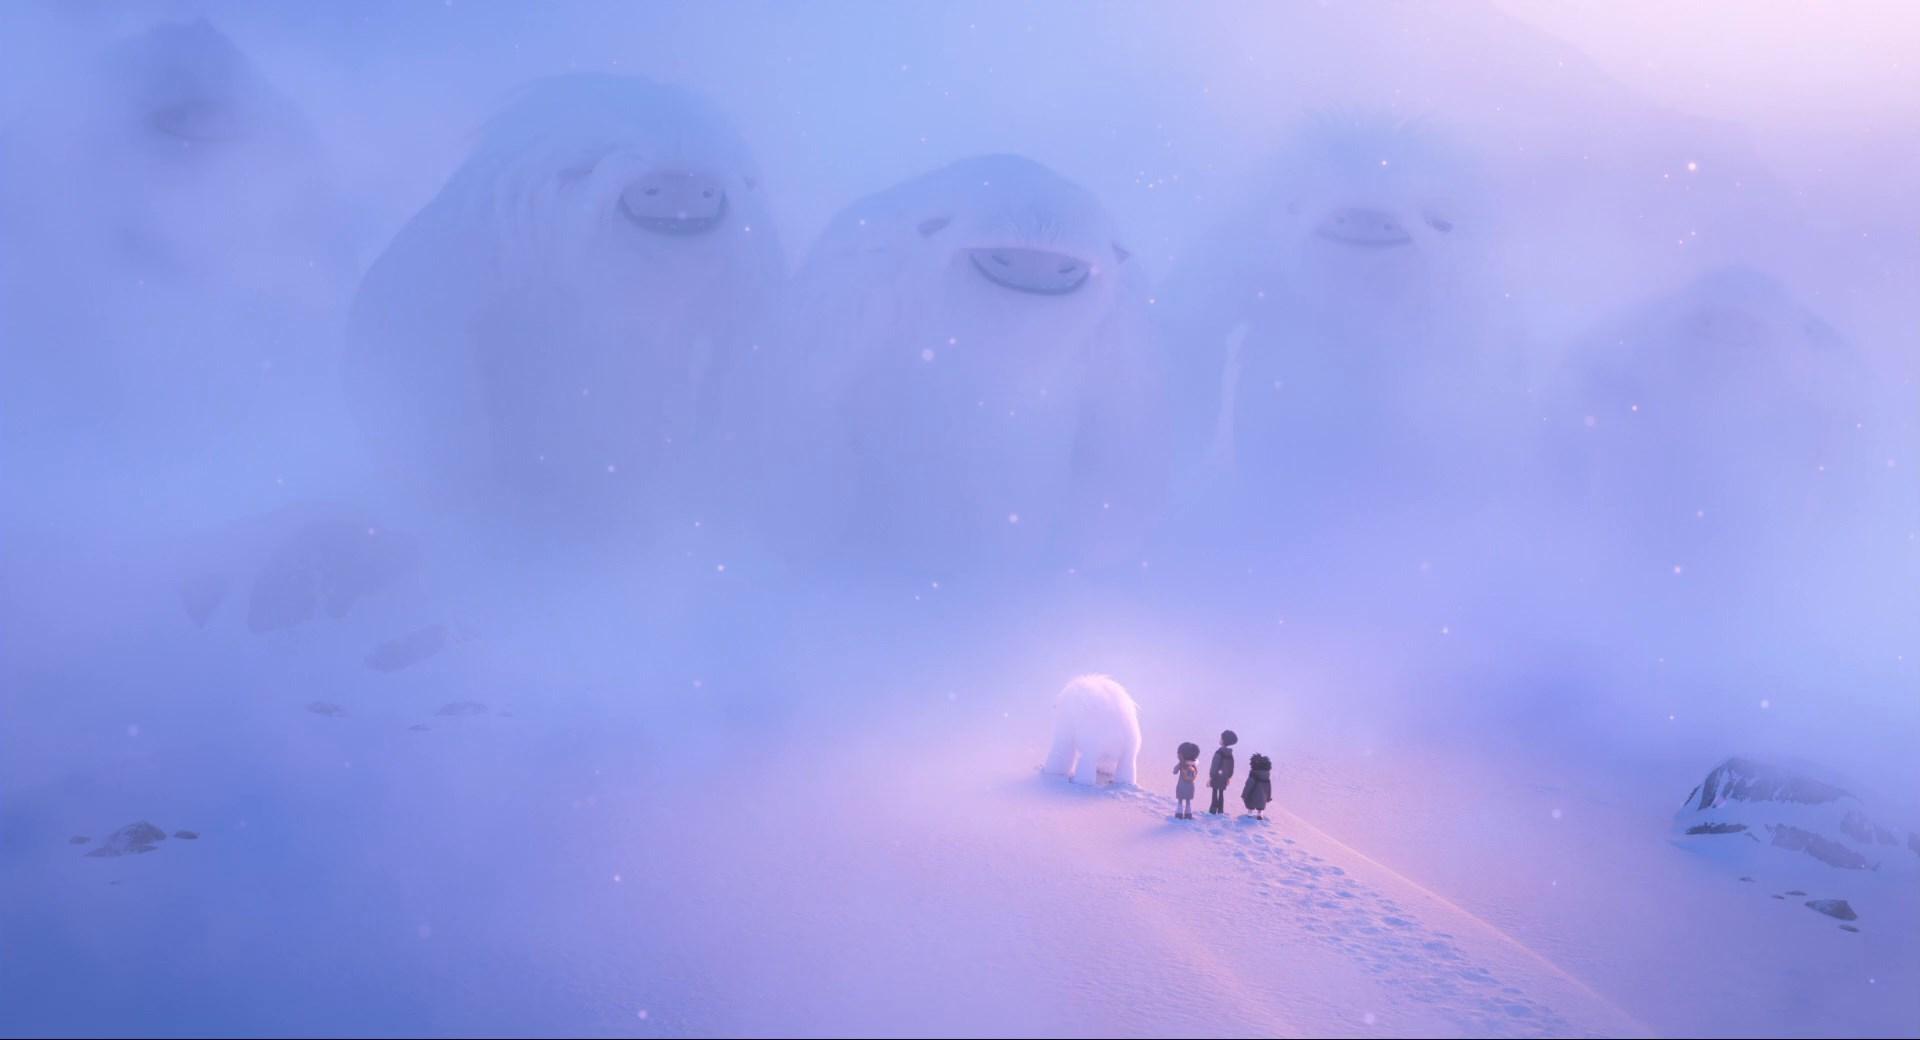 [Resim: abominable.2019.1080pdikyx.jpg]